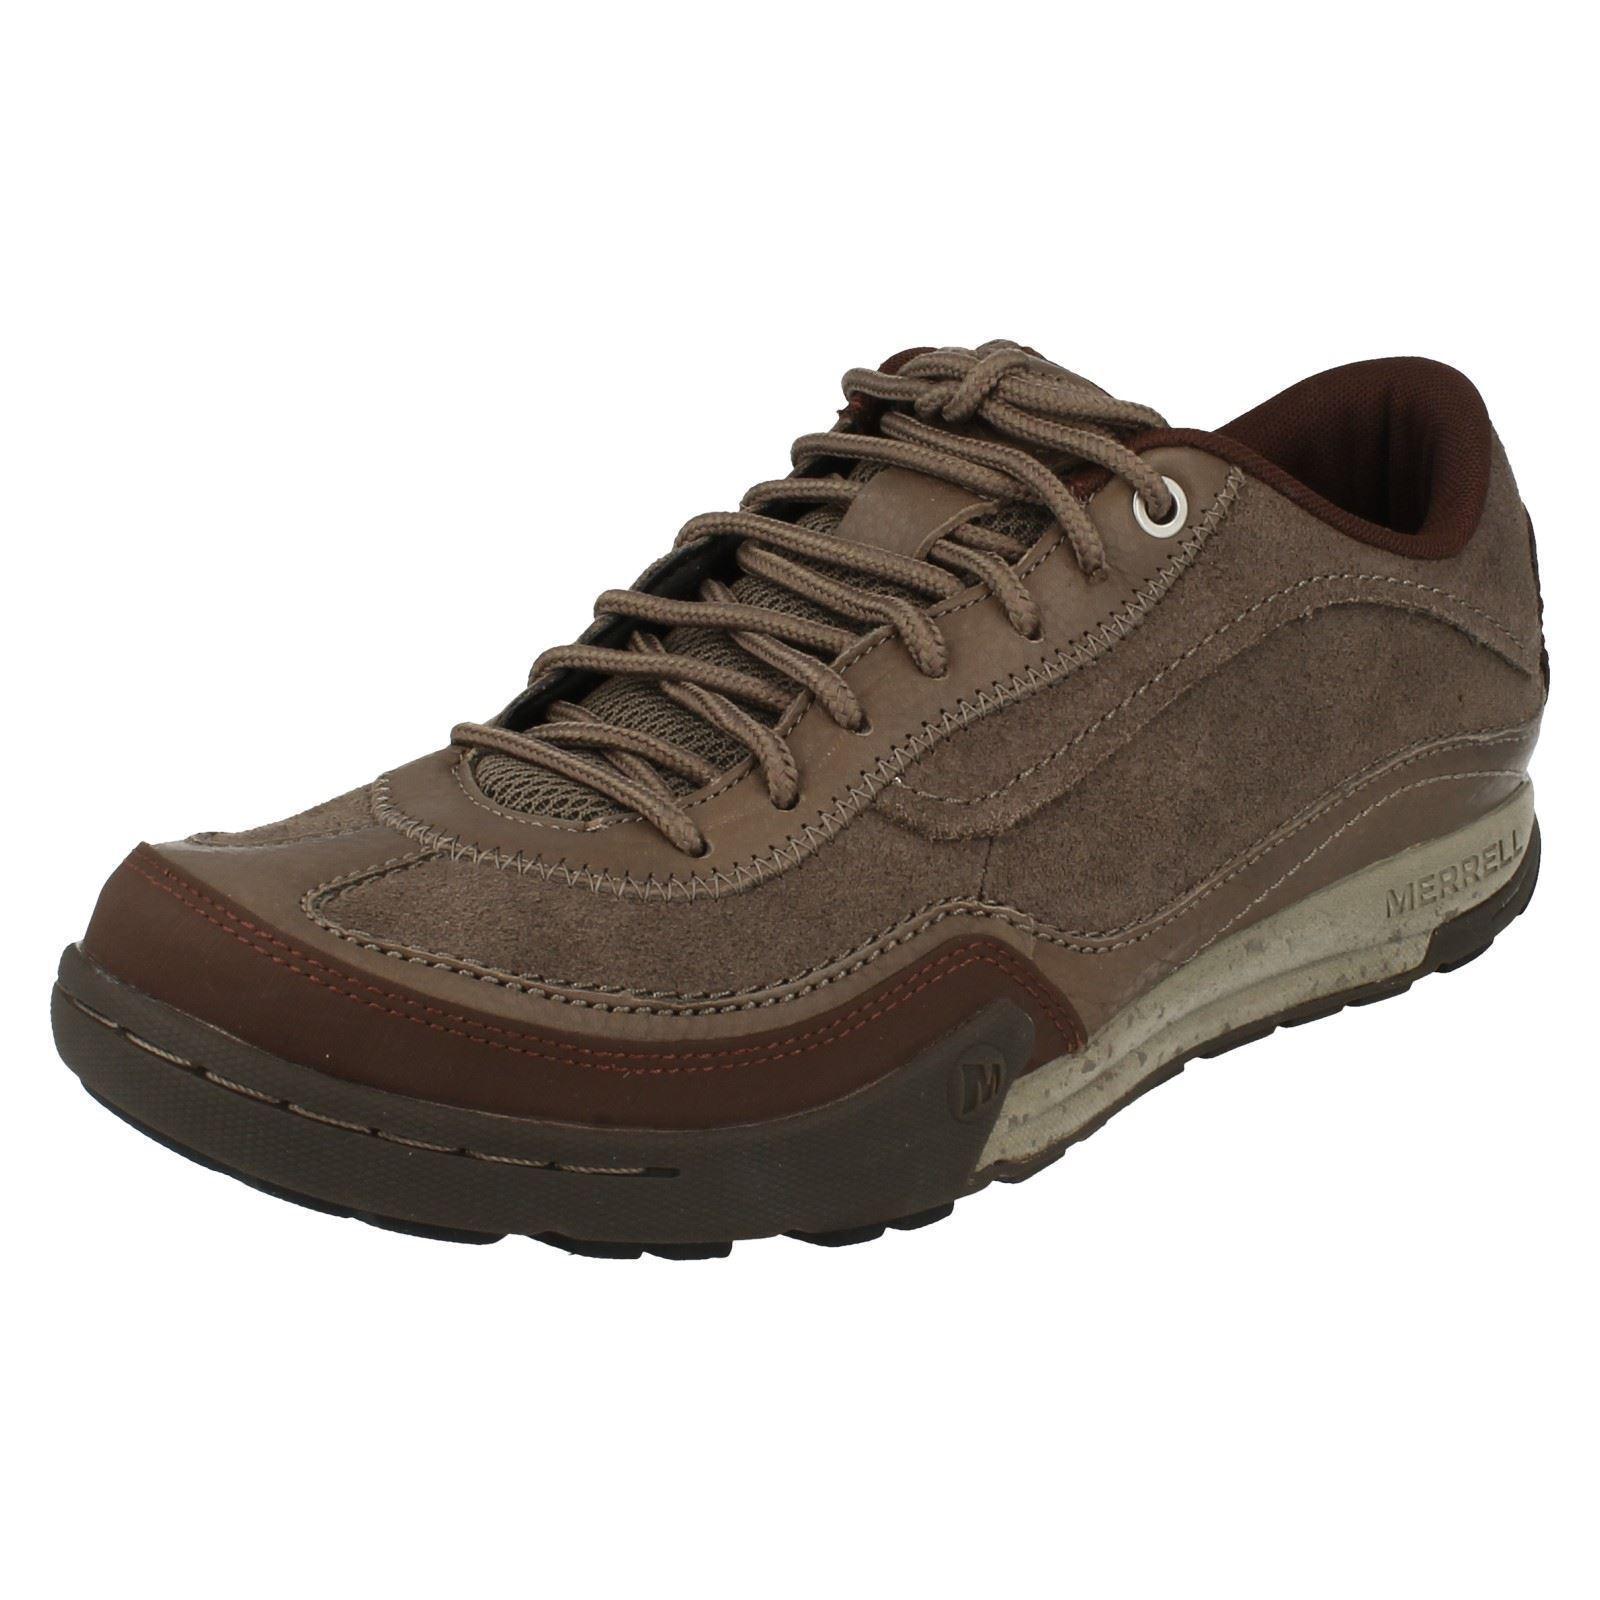 uomo da montagna Diggs Scarpe sportive da camminata da Merrell retail